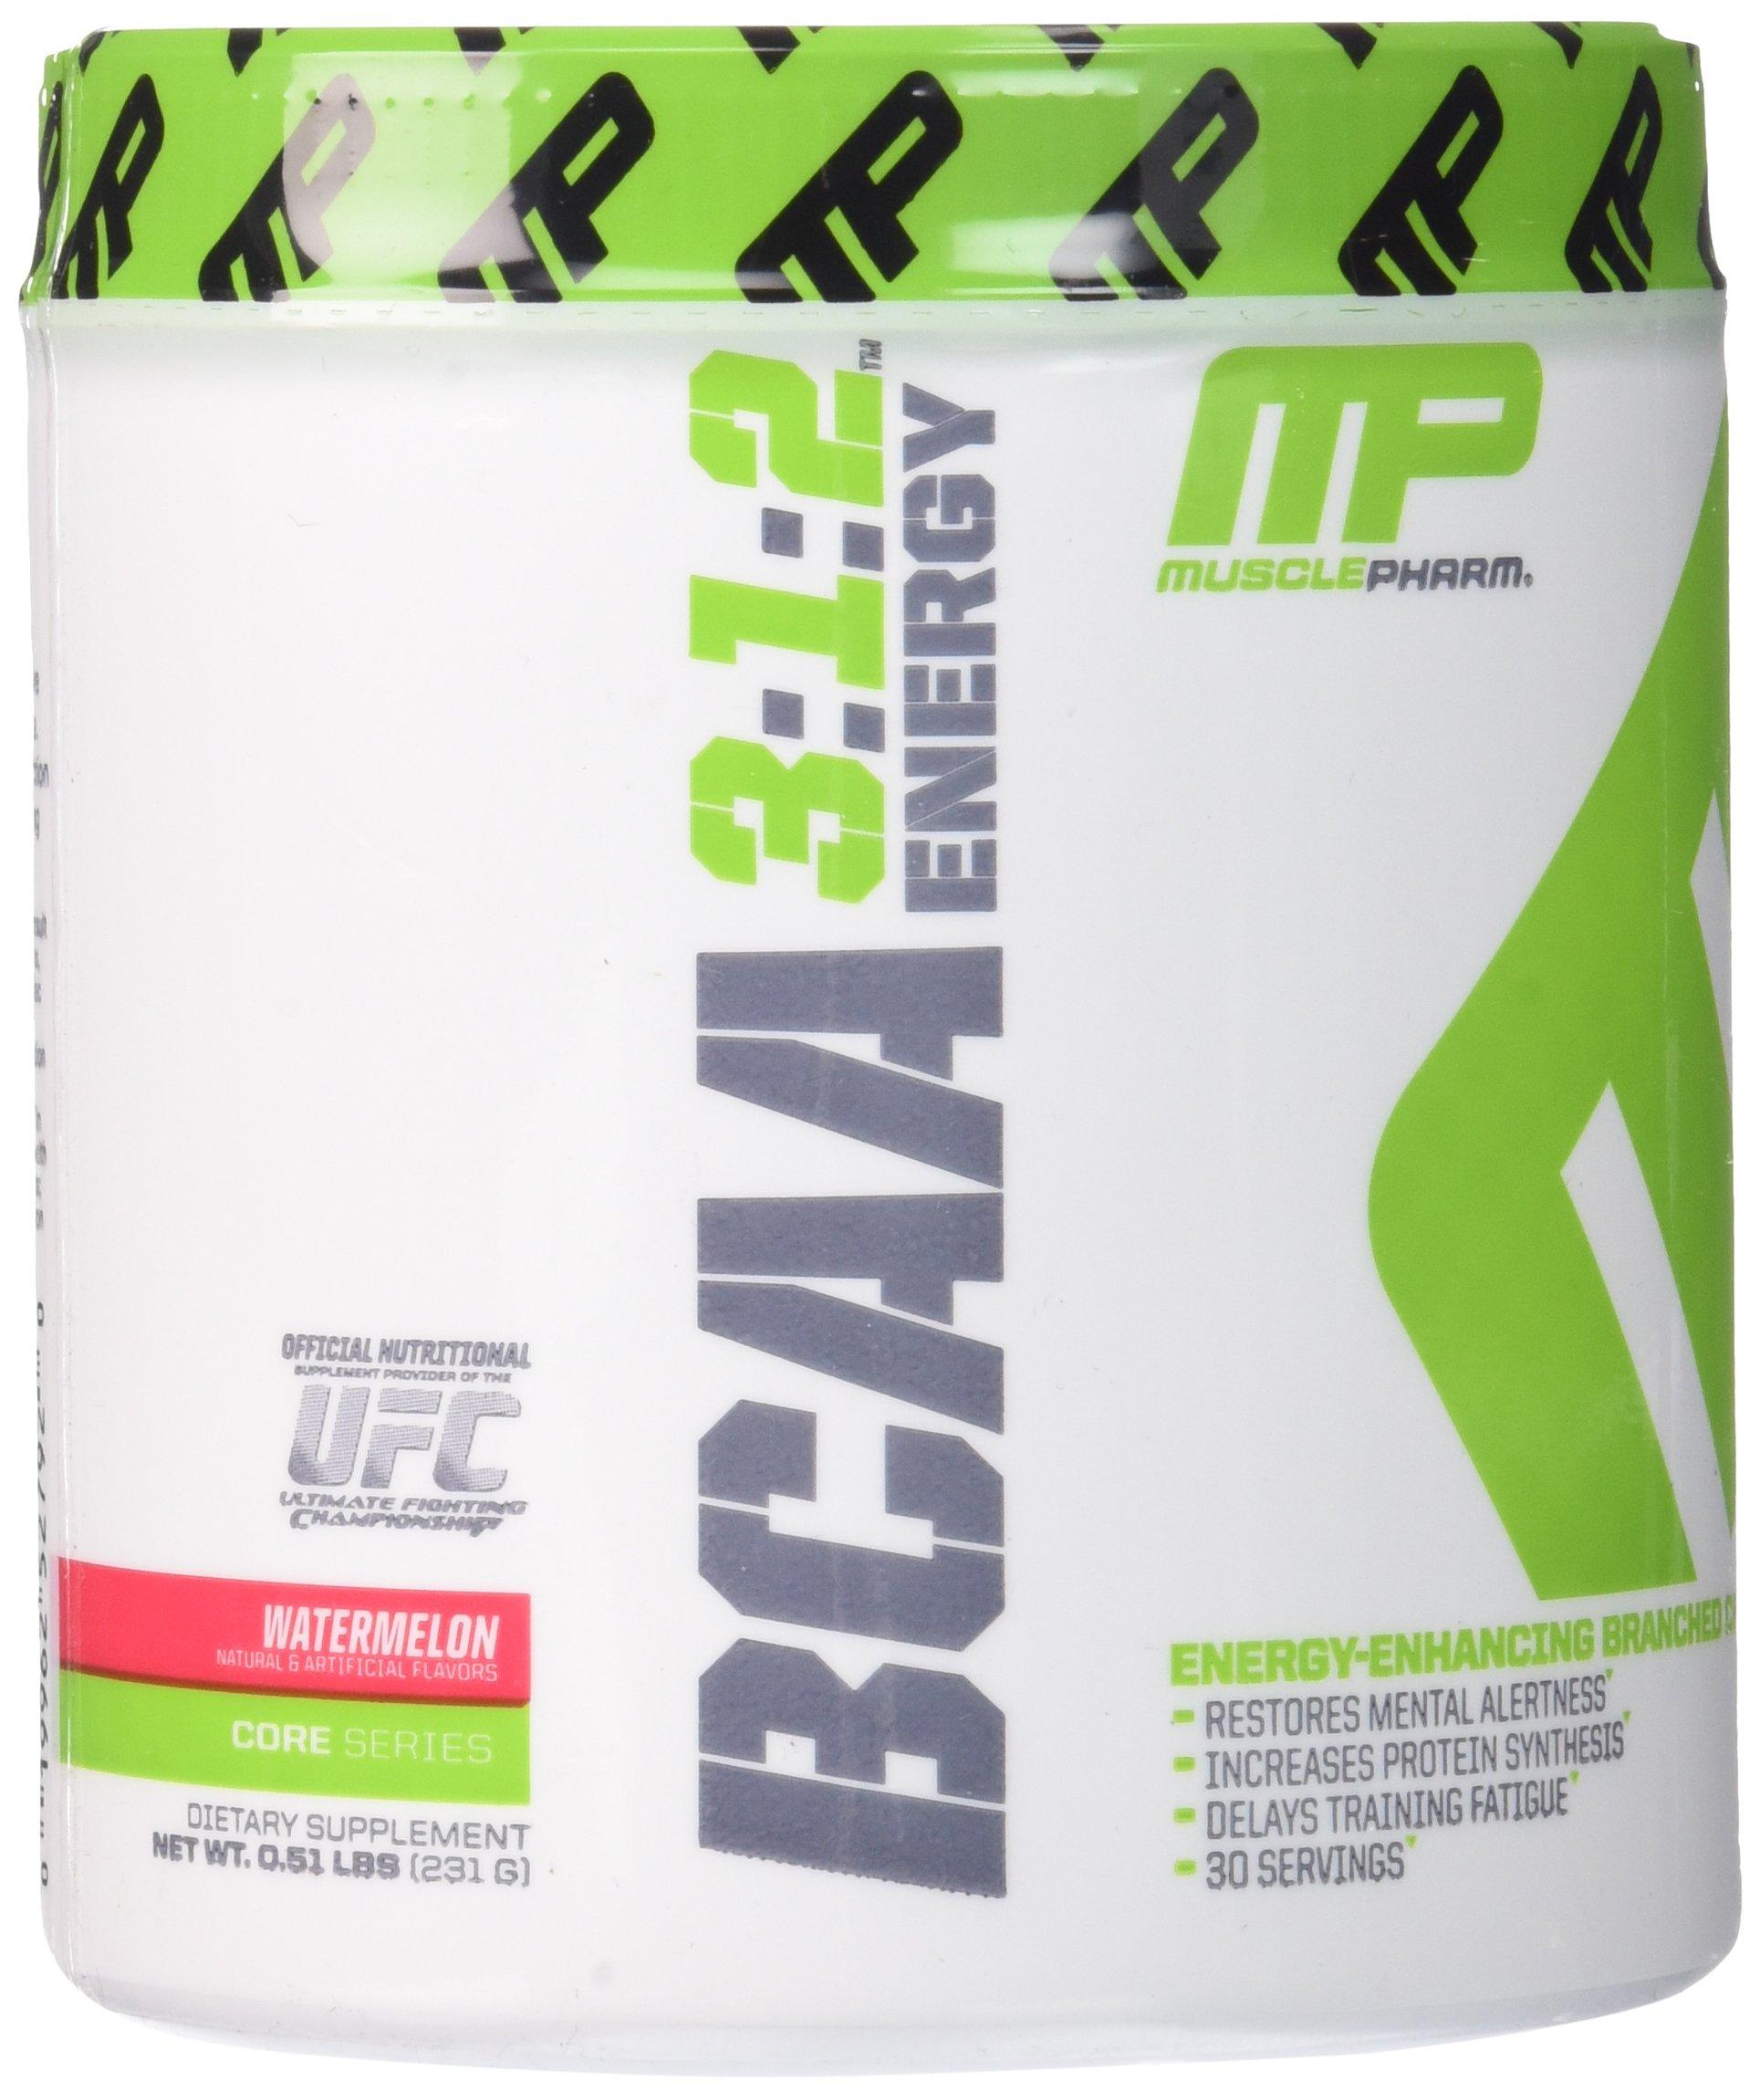 Muscle Pharm BCAA Energy Powder, Watermelon, 0.51 Pound